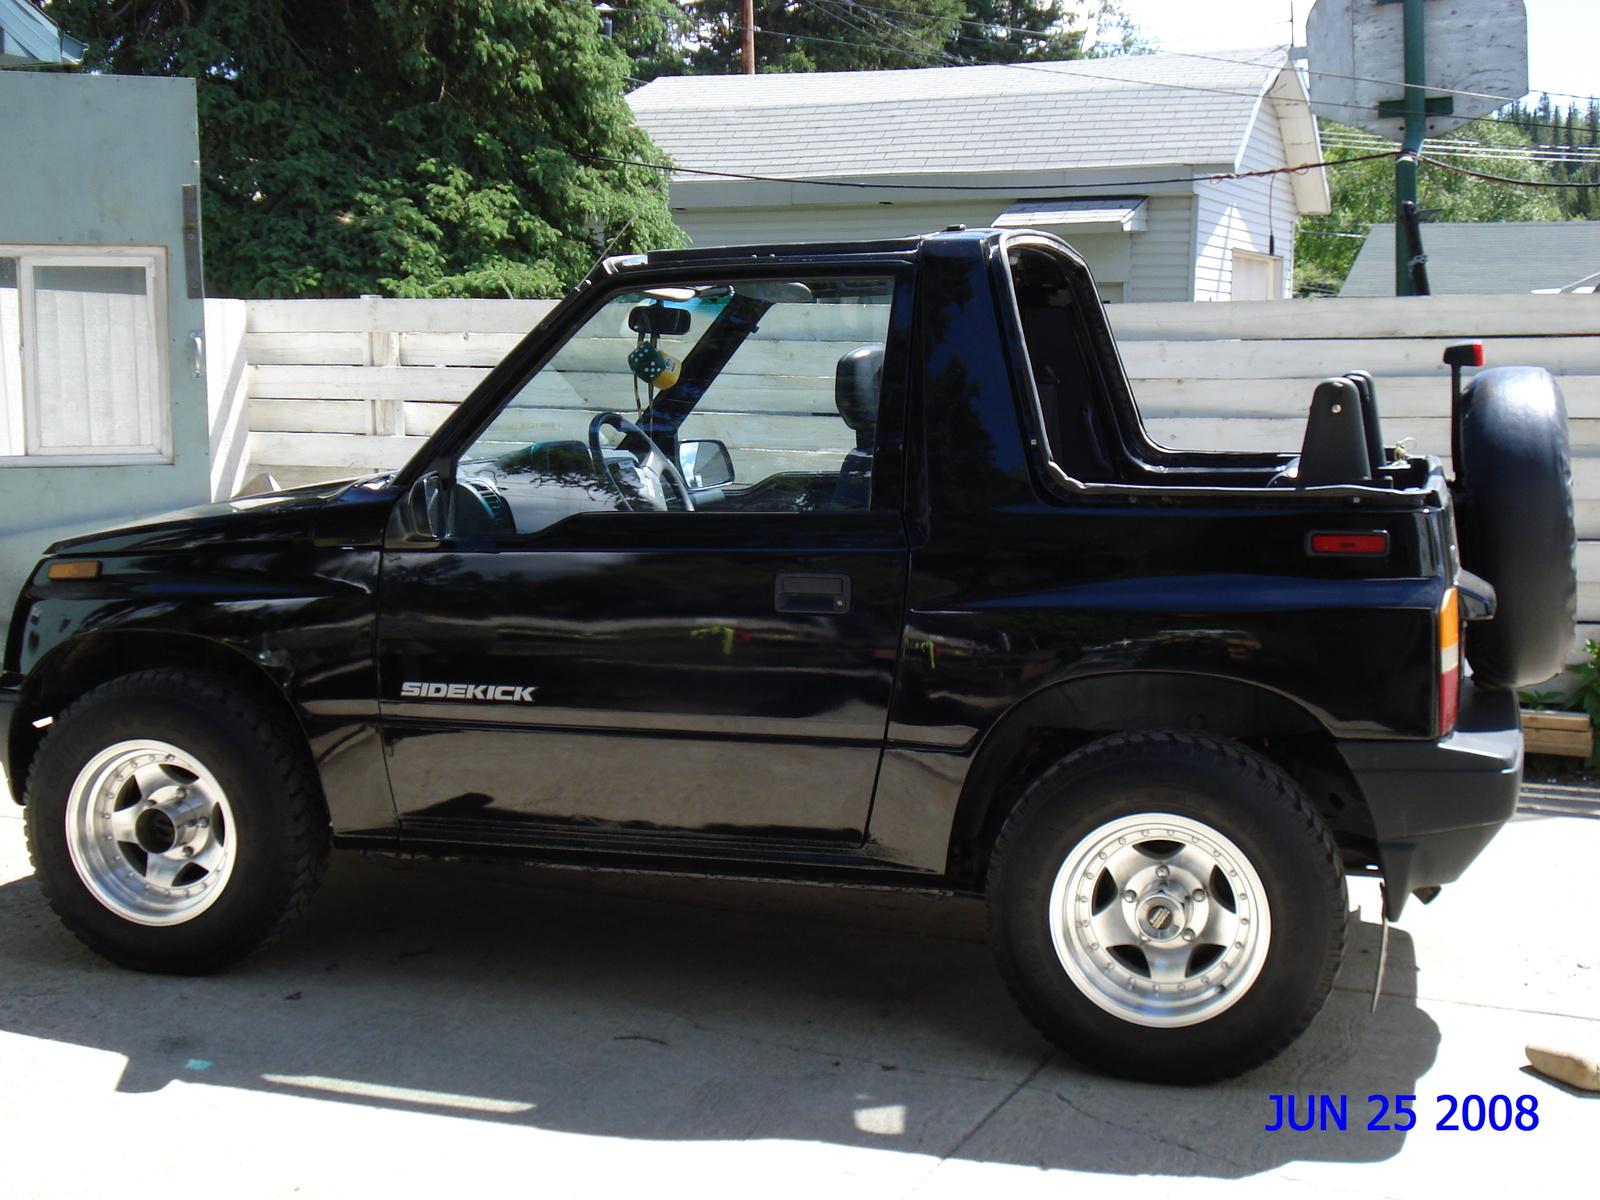 Suzuki Sidekick Picture   14   Reviews  News  Specs  Buy Car